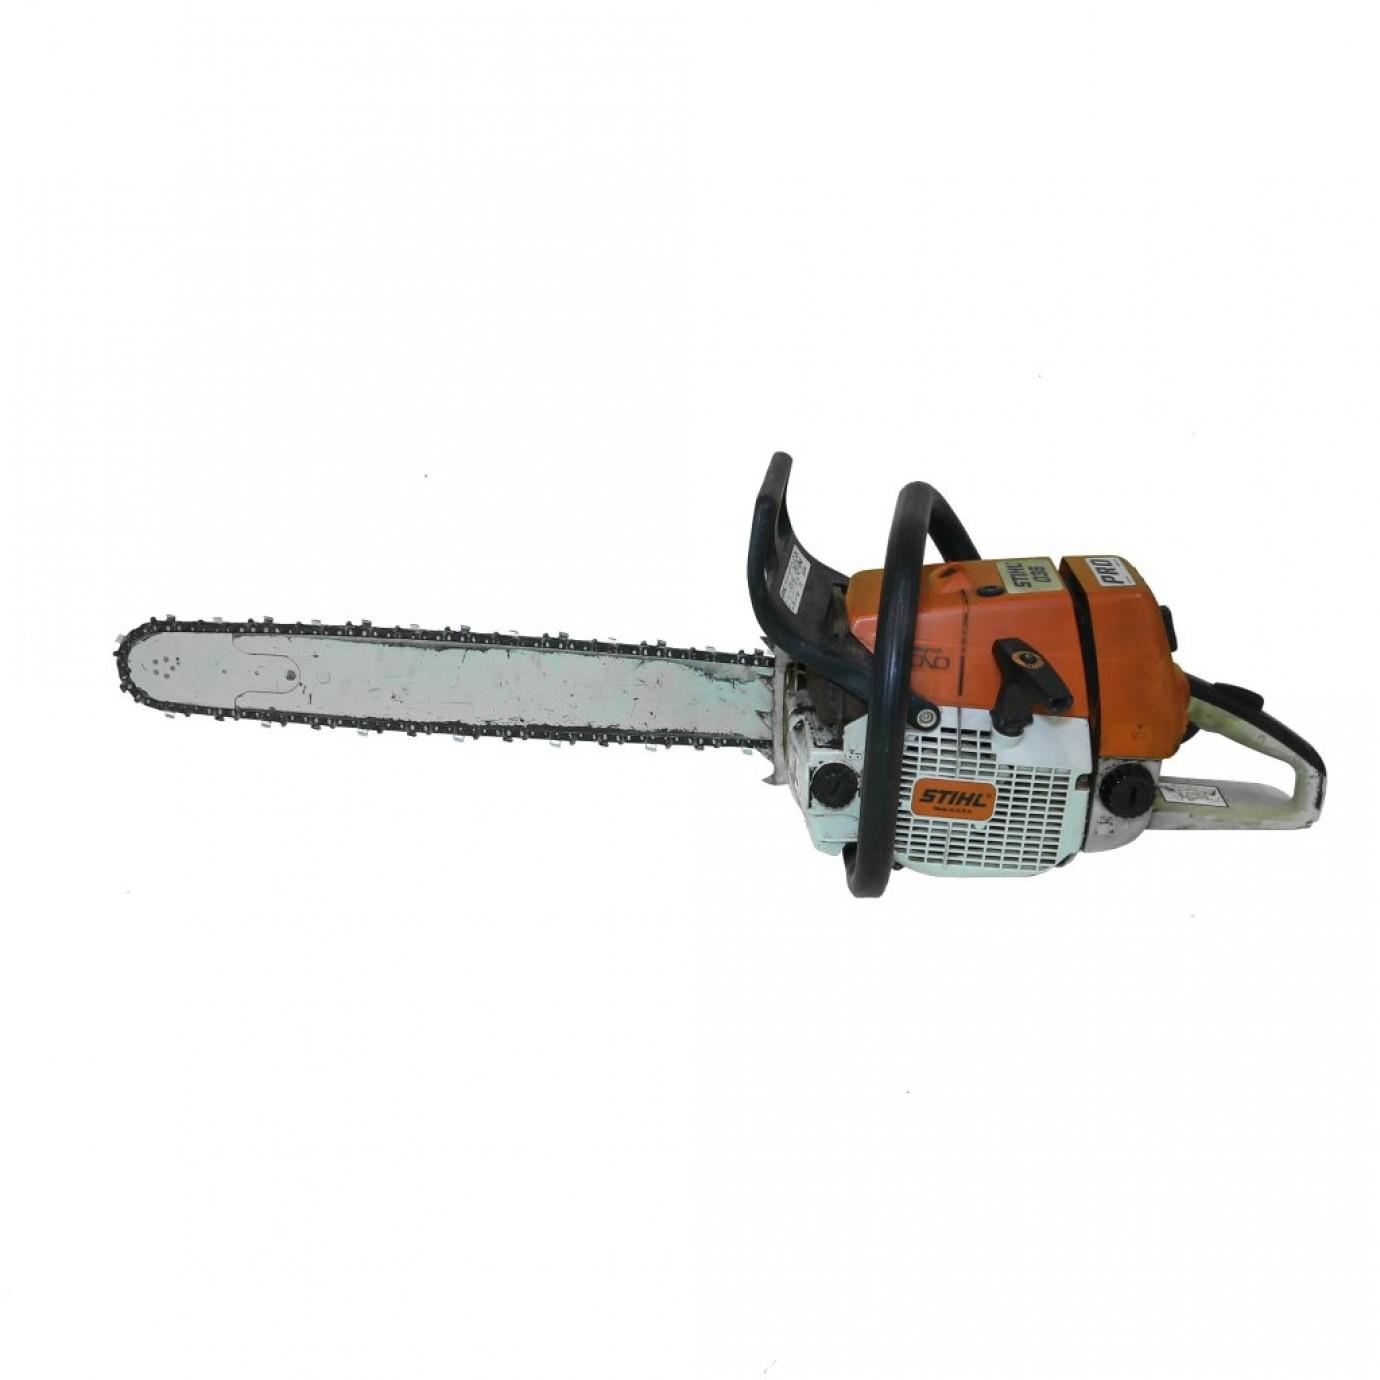 Stihl Chain Saw   Roath's Pawn